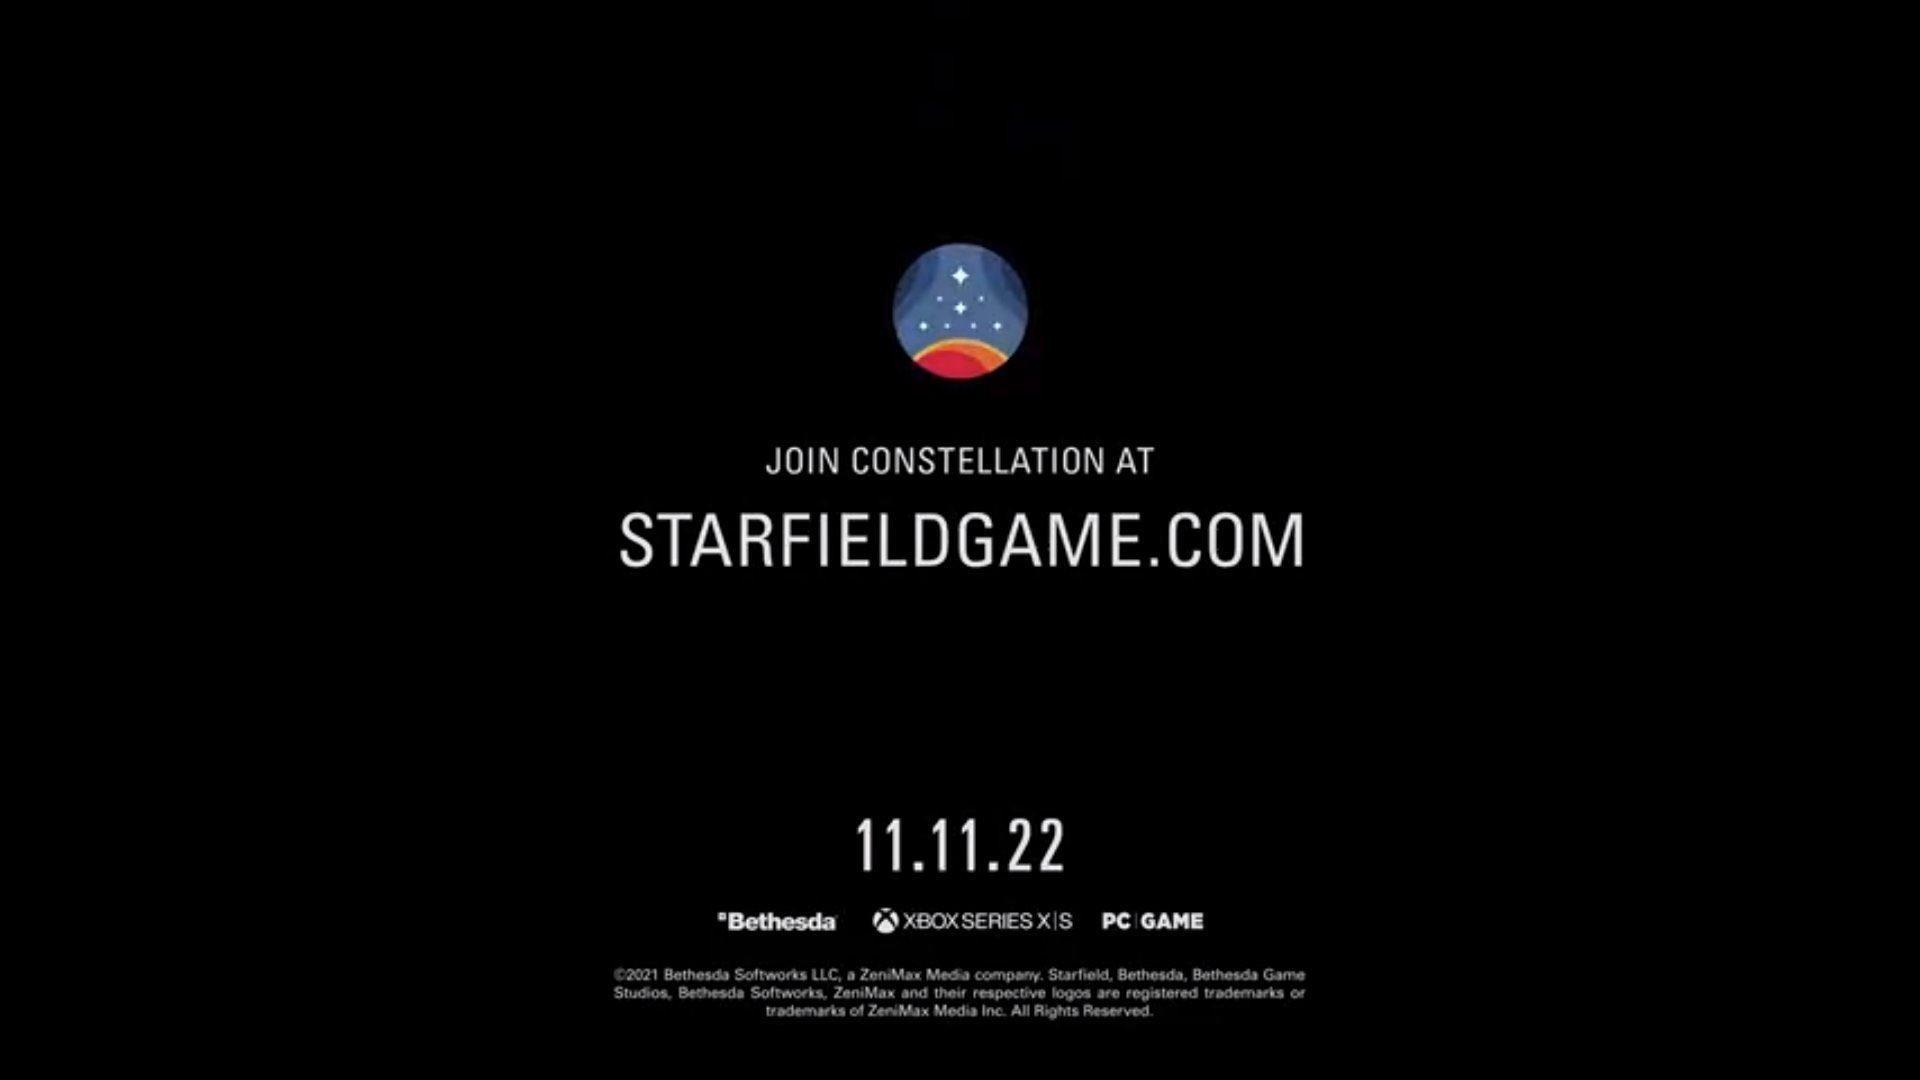 Starfield release datge